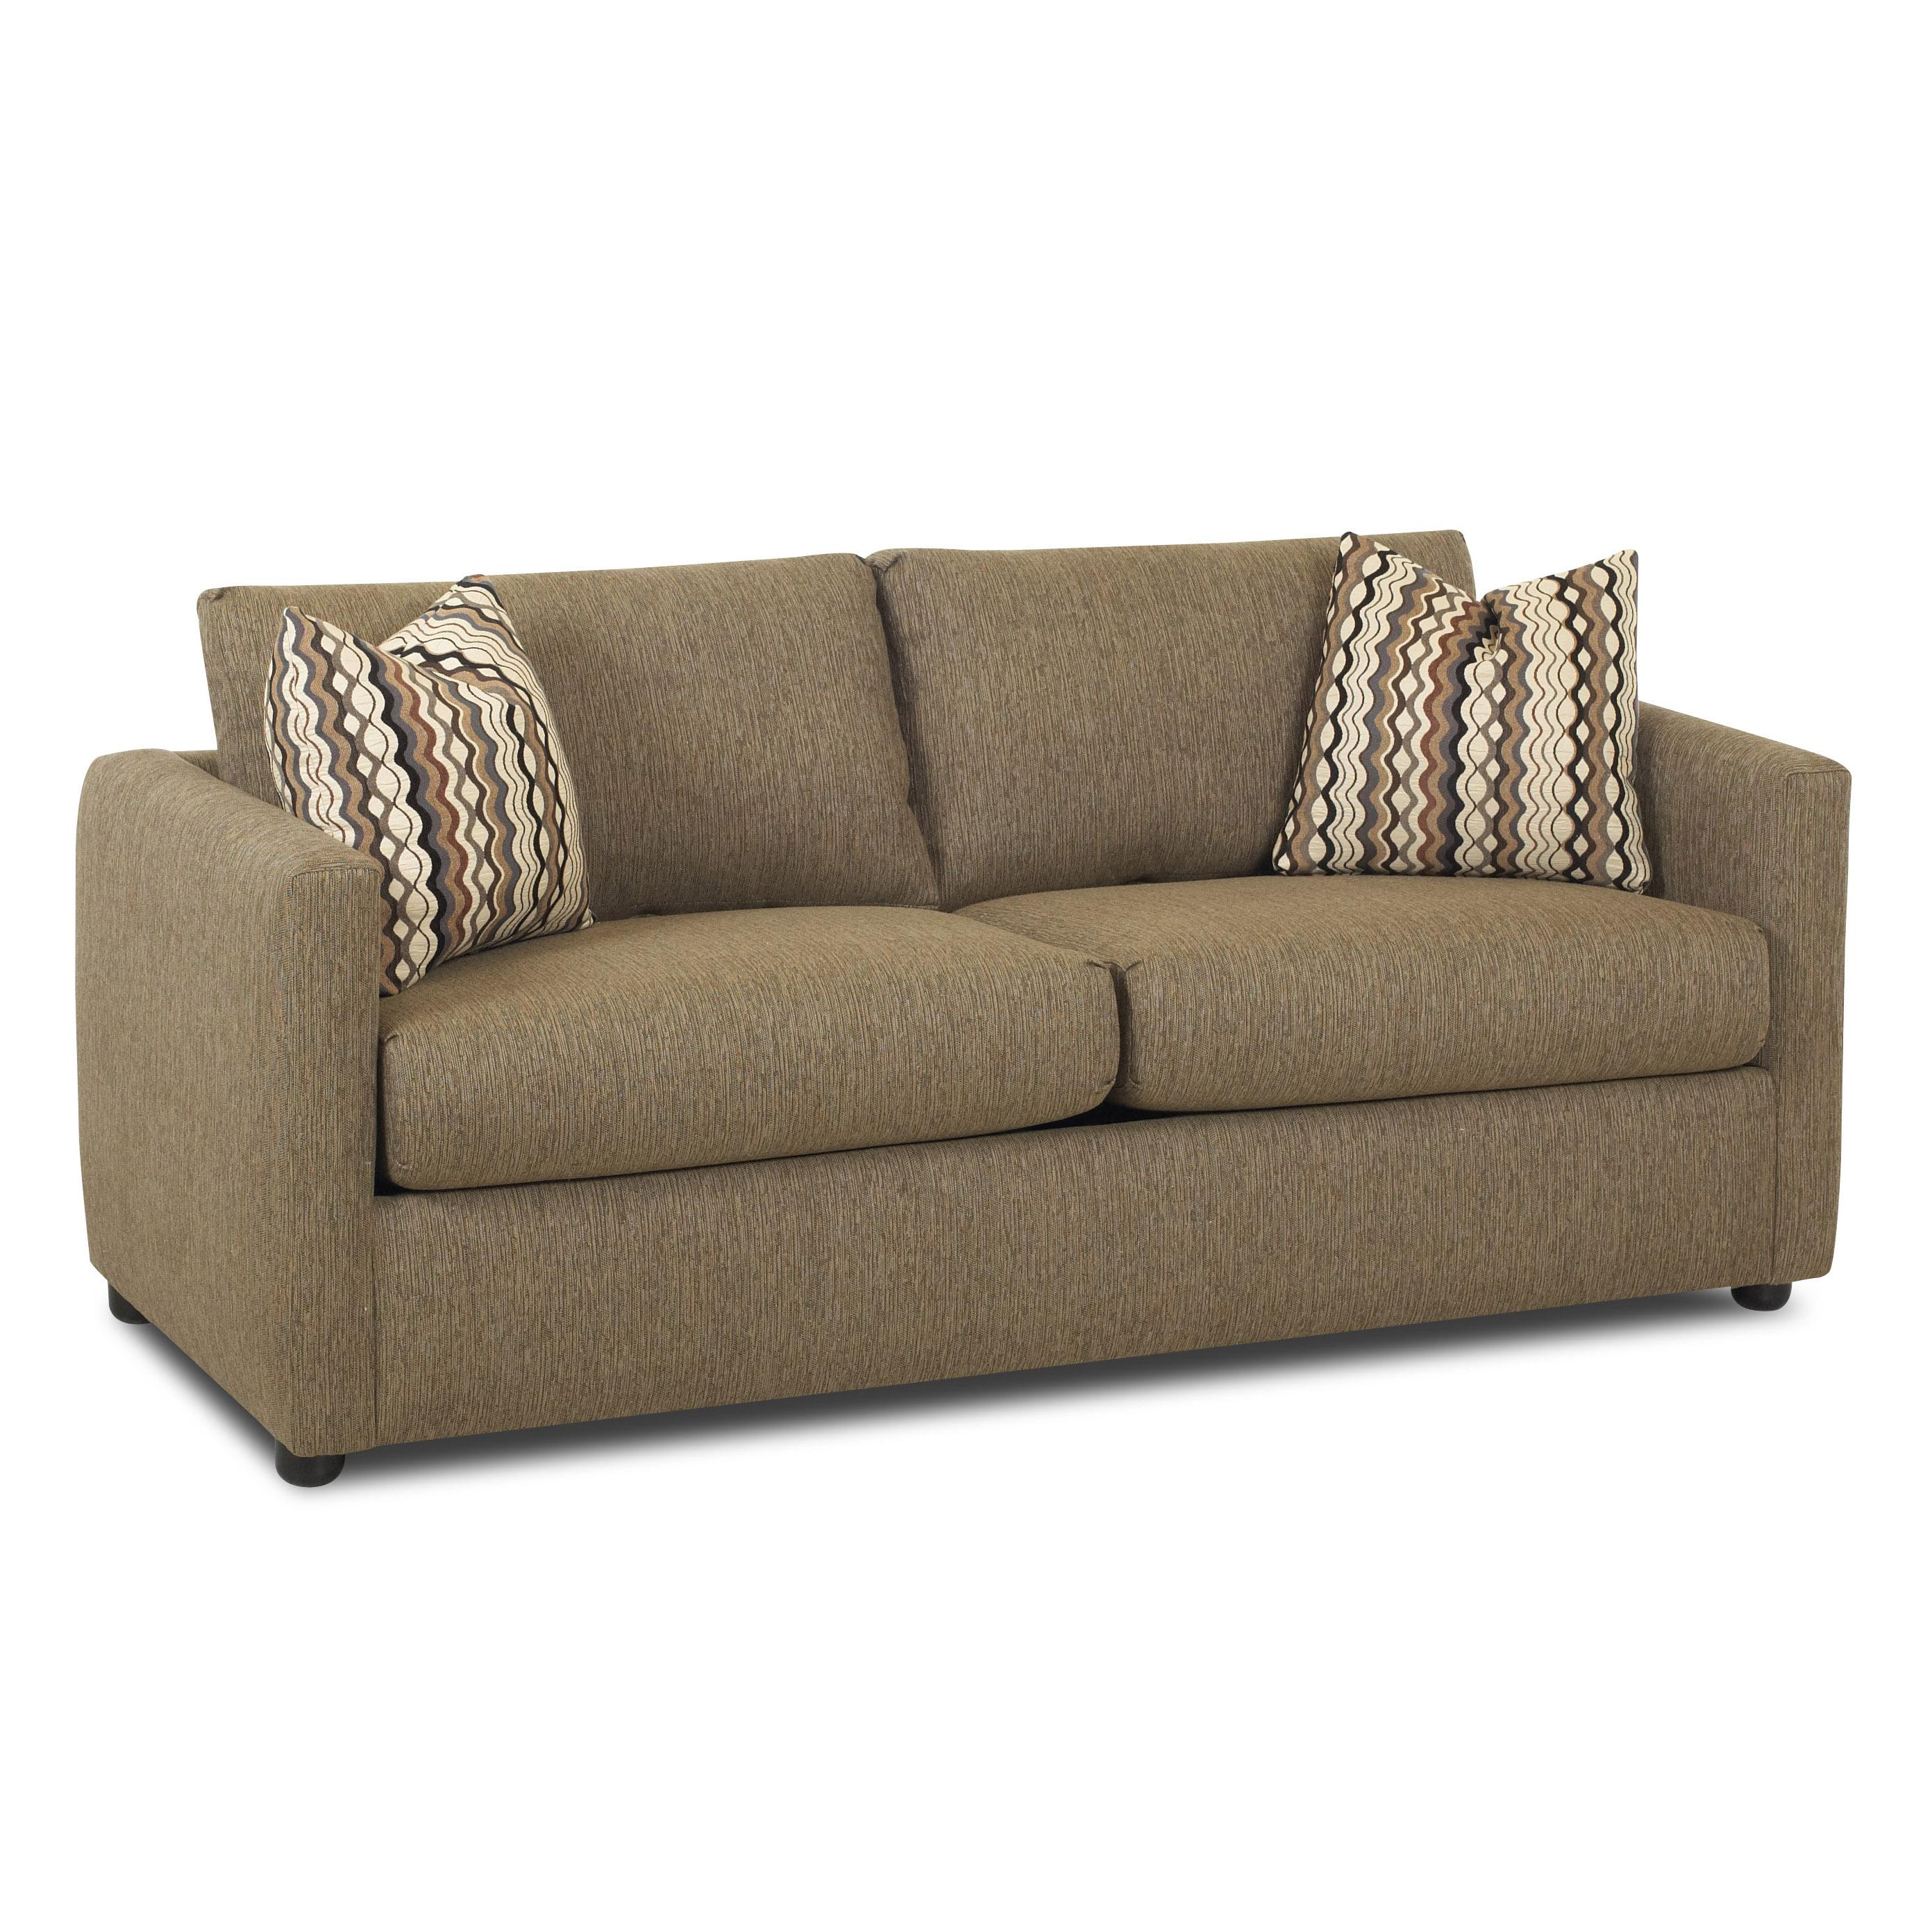 regular full size sleeper sofa by klaussner wolf and gardiner wolf furniture. Black Bedroom Furniture Sets. Home Design Ideas